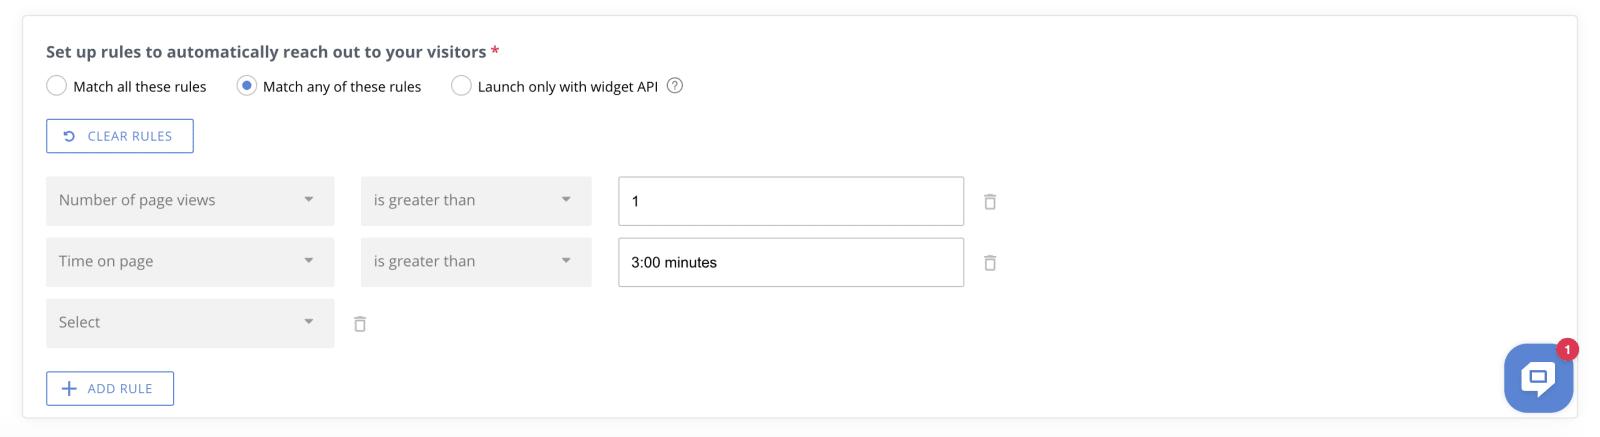 HelpCrunch Targeted Messages